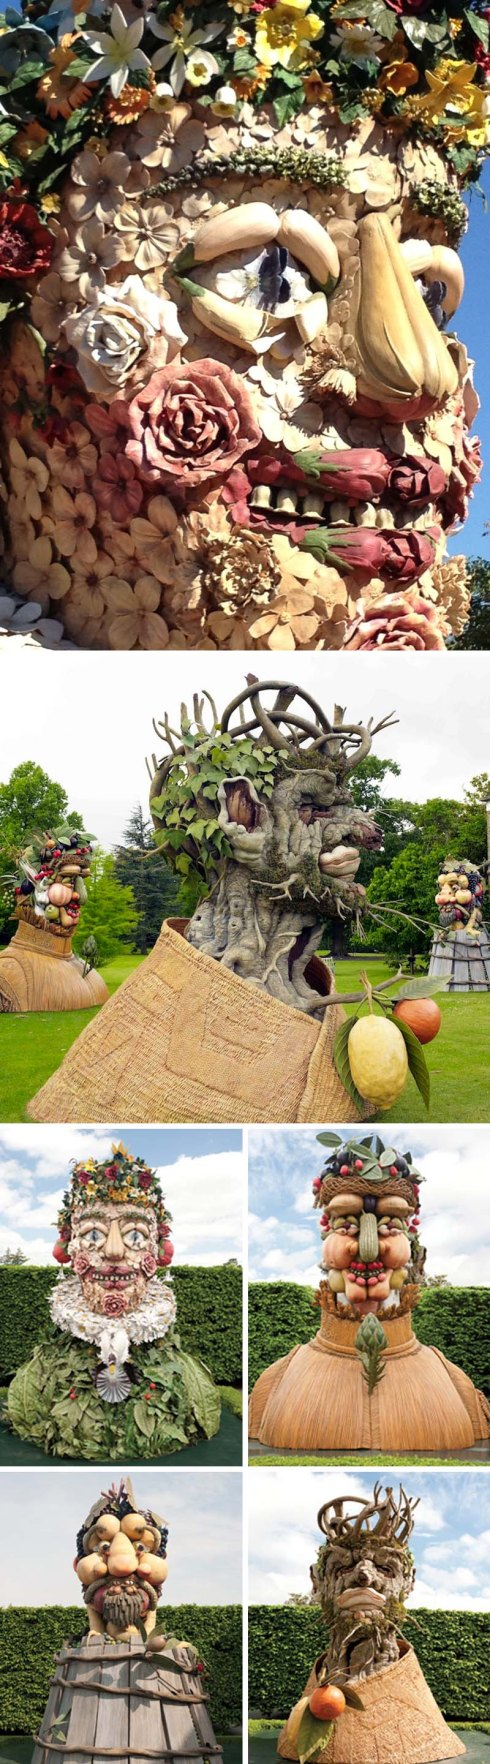 Philip Haas, Four Seasons en Nueva York Botanical Gardens, Escultura.  arcimboldo